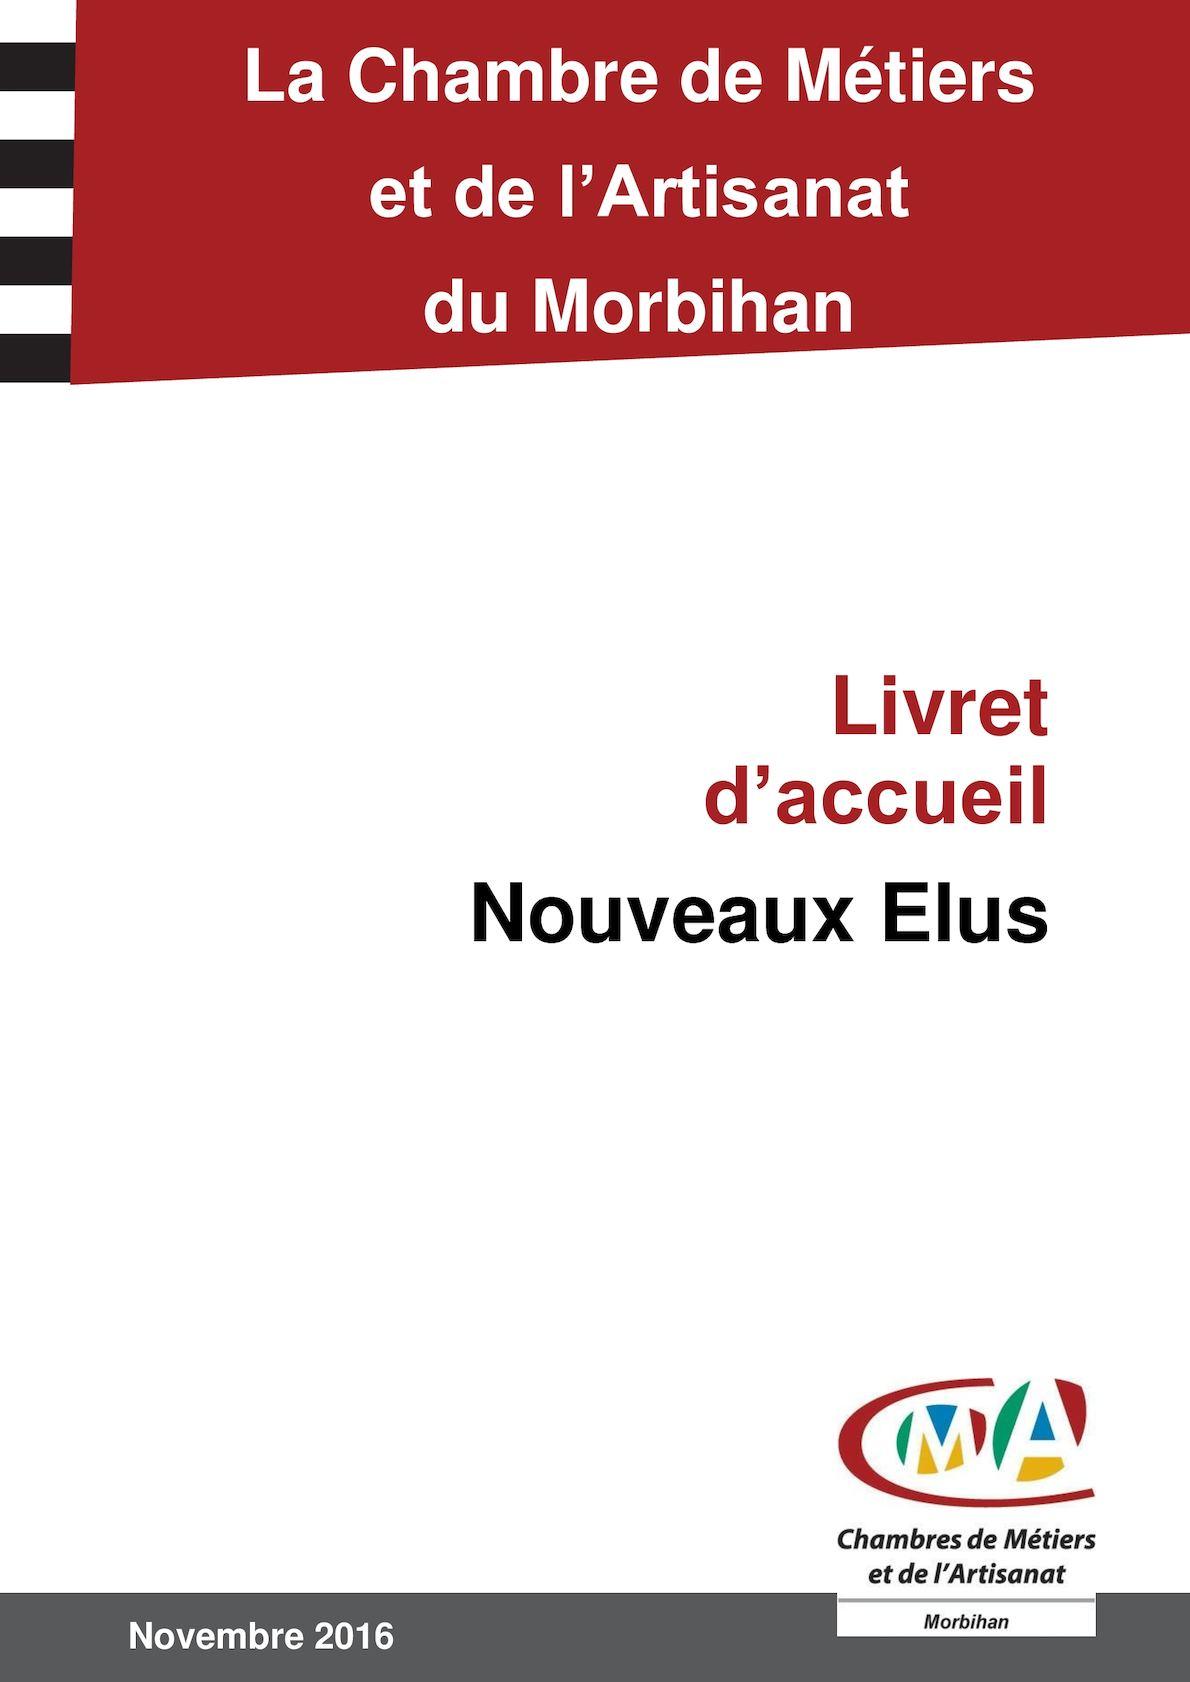 Calaméo - Livret Accueil Elus V1